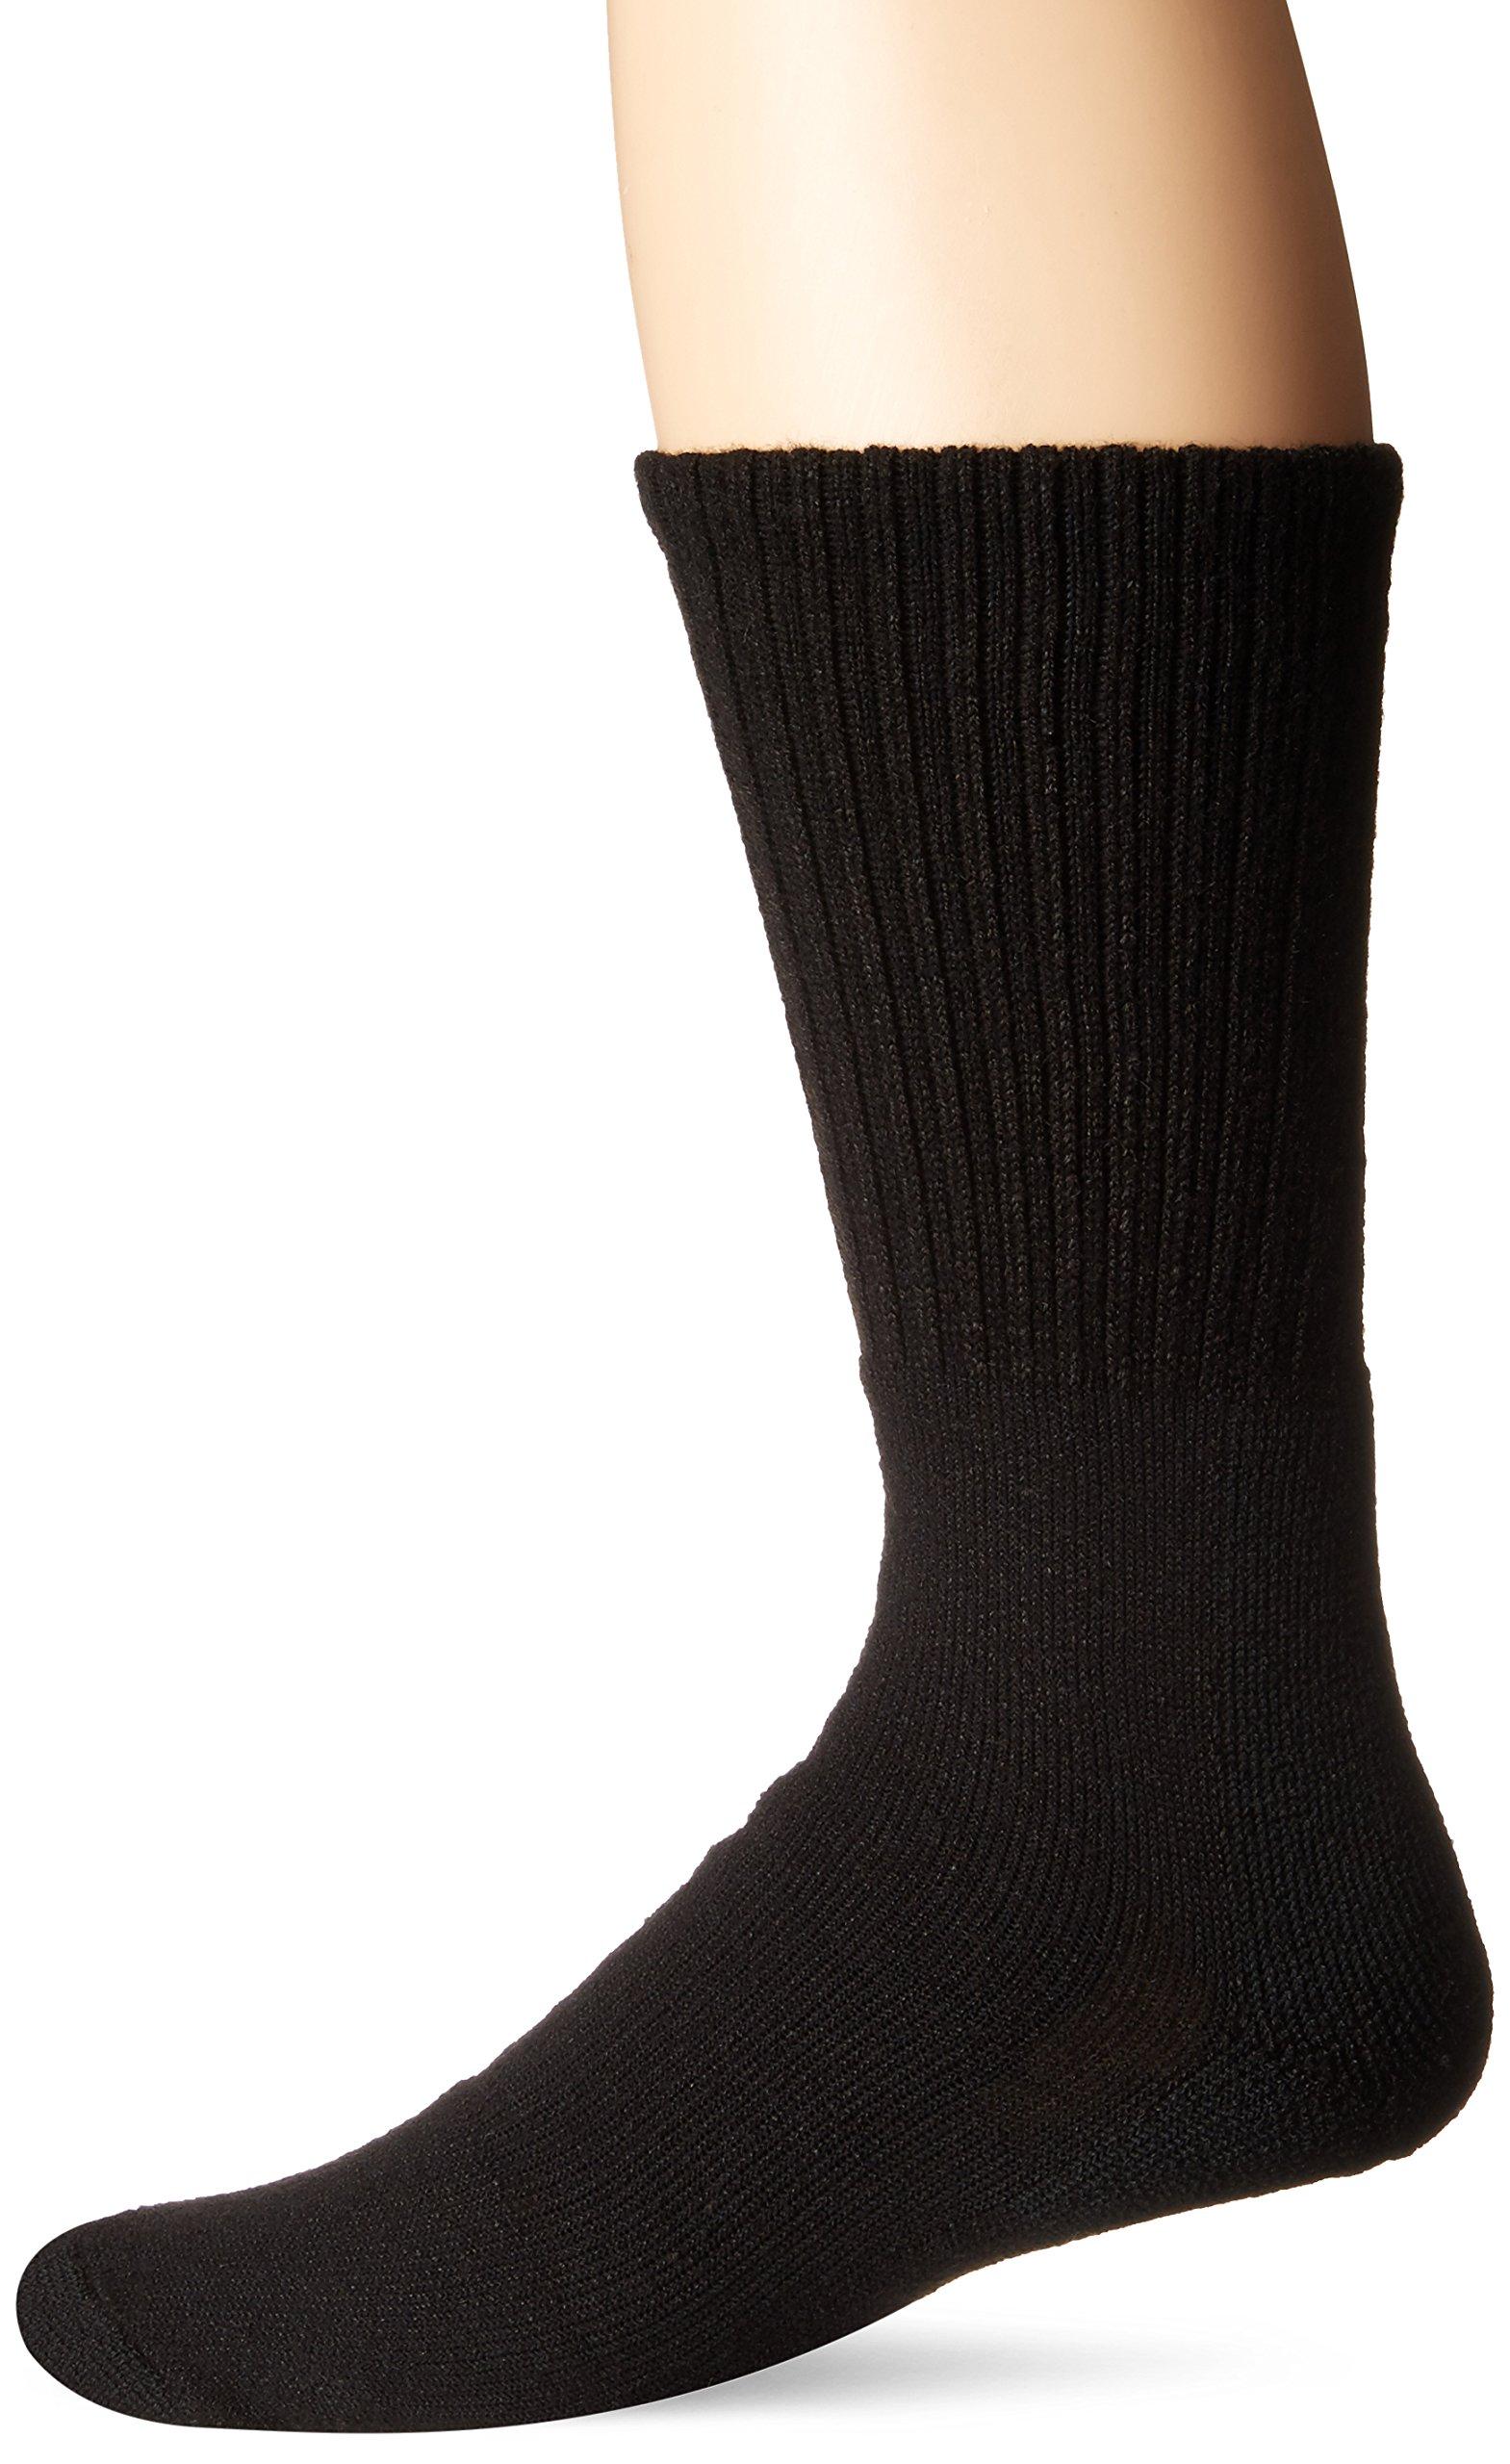 Thorlos Unisex TBX Tactical Padded Crew Sock, Black, Medium